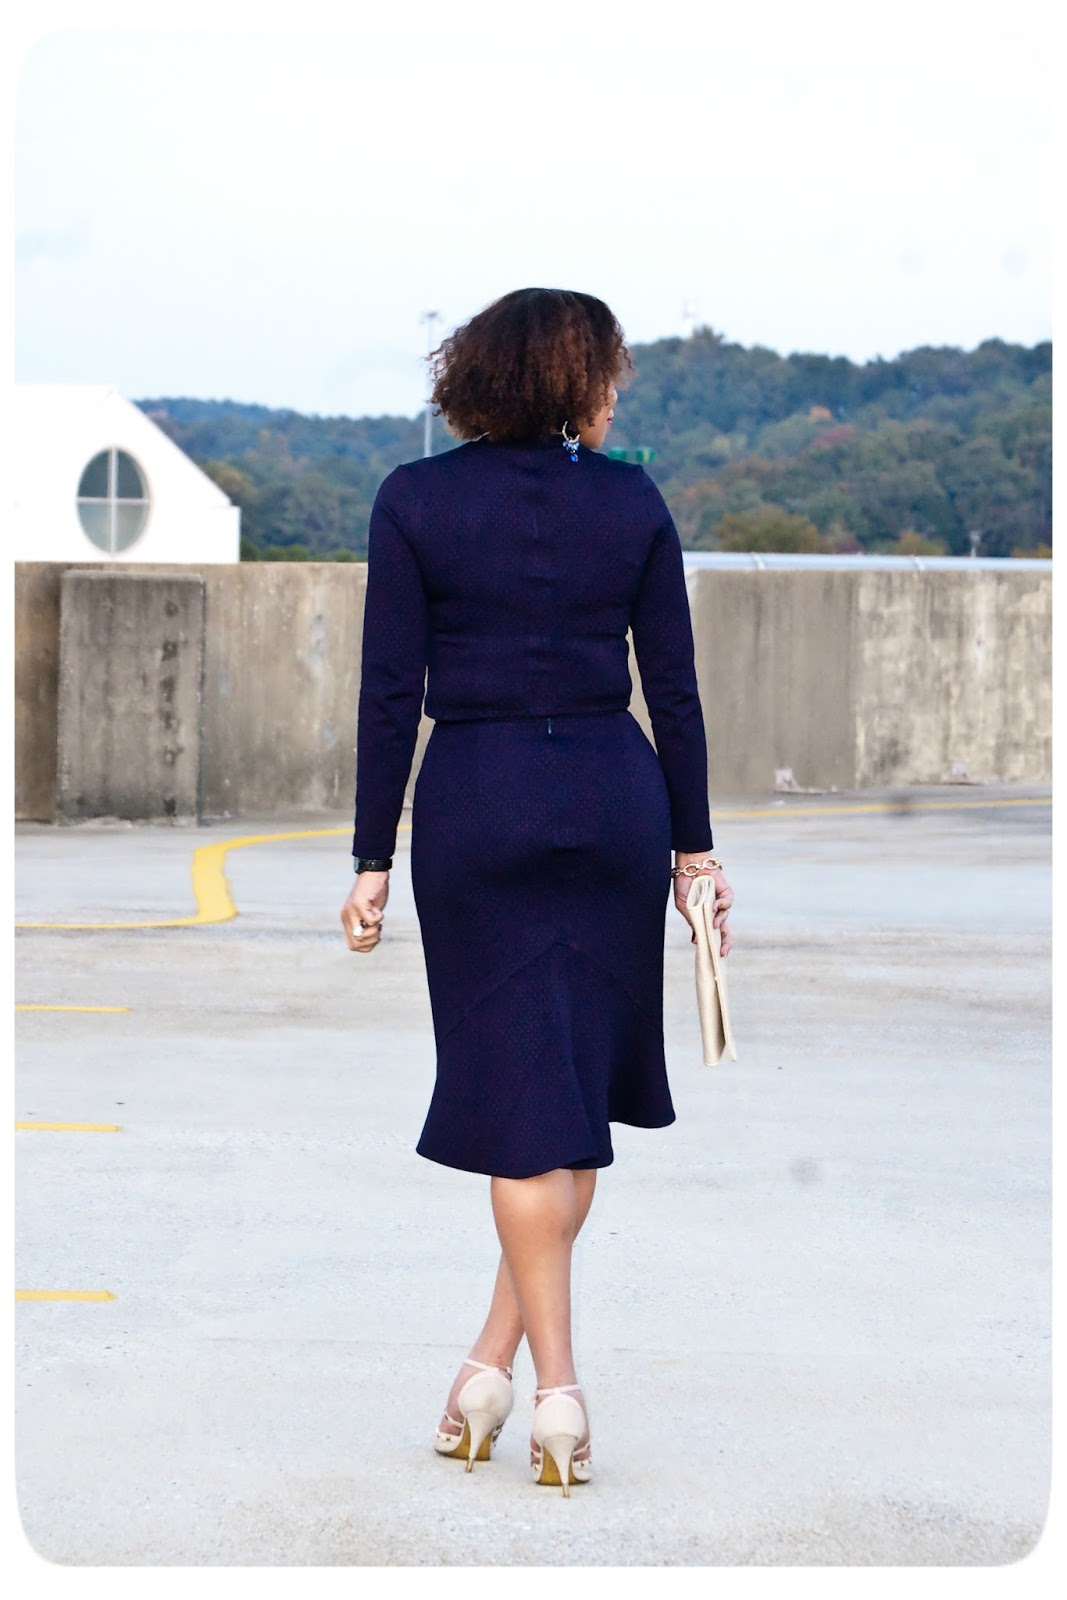 Simplicity 1283 & Vogue 1296 - Erica B's DIY Style